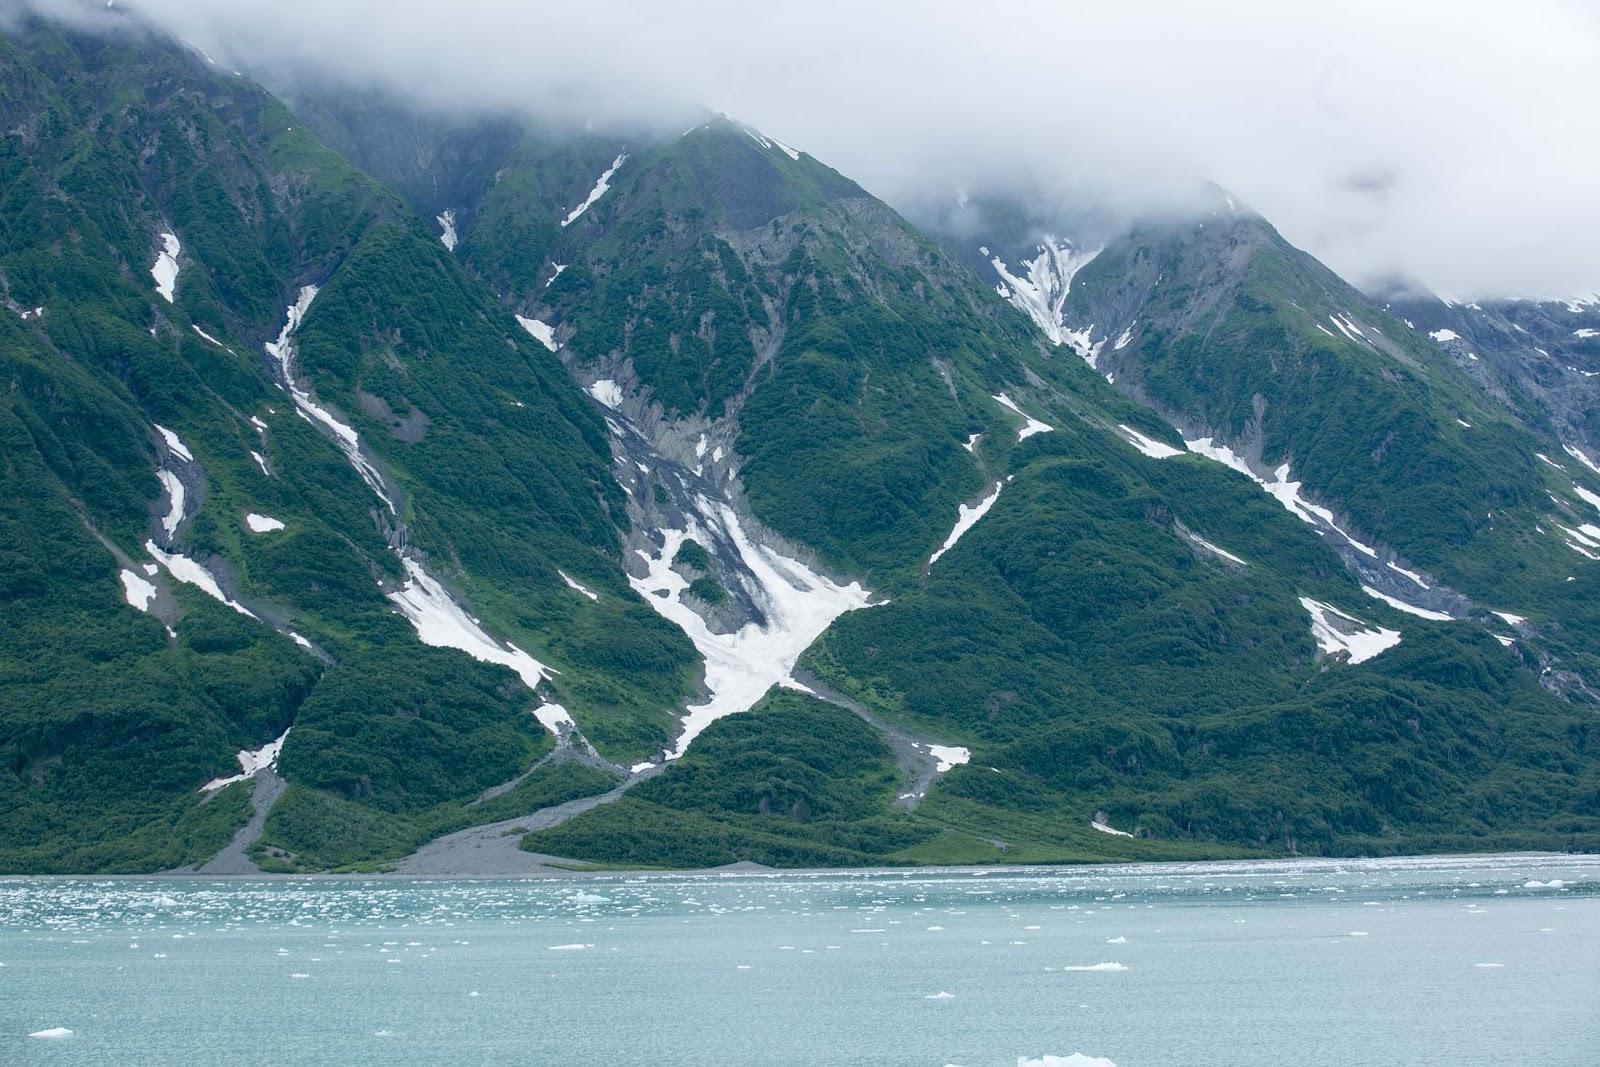 Greenery and snow on Hubbard Glacier